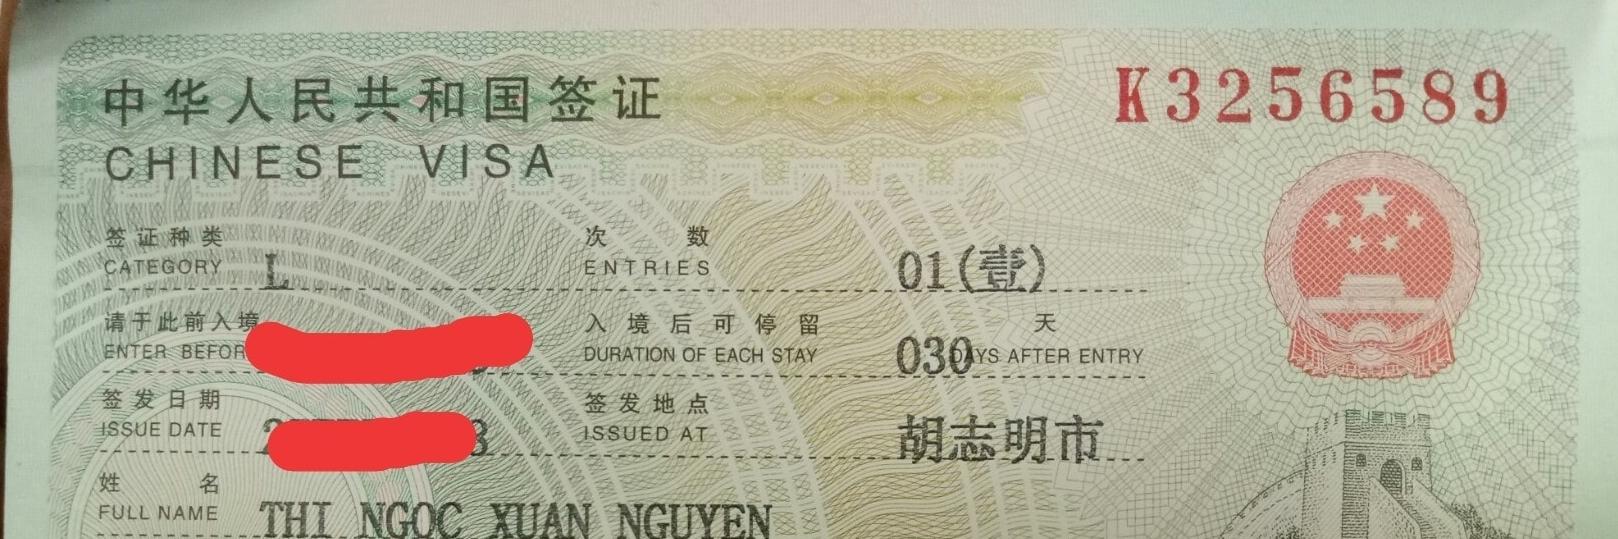 https://gody.vn/blog/visadulichnuocngoai/post/kinh-nghiem-xin-visa-du-lich-trung-quoc-2231